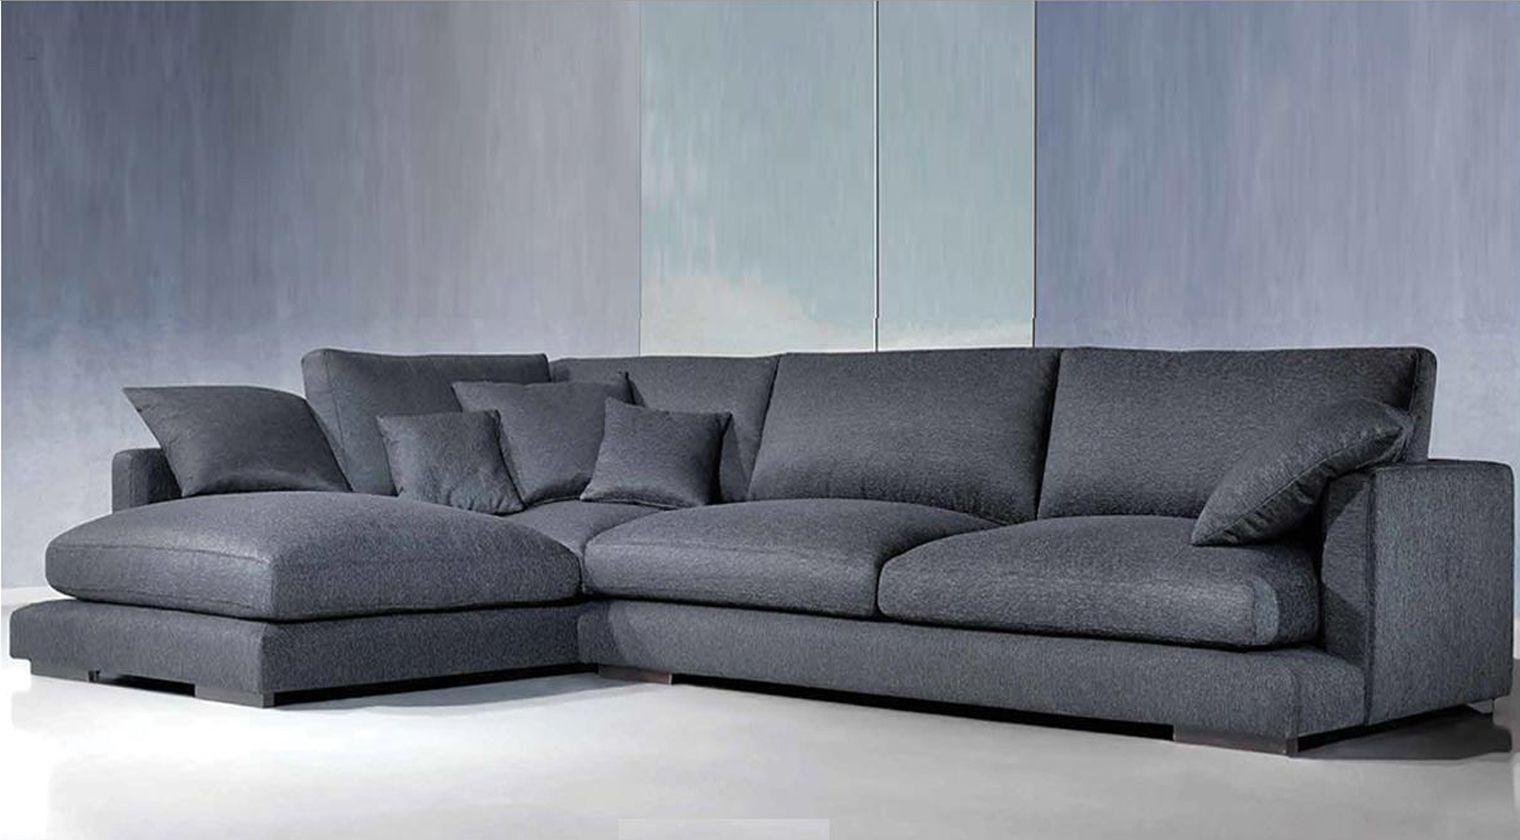 Sofa Cuatro Plazas Tldn Chaise Longue Tela Perseo Aise Longue Tela